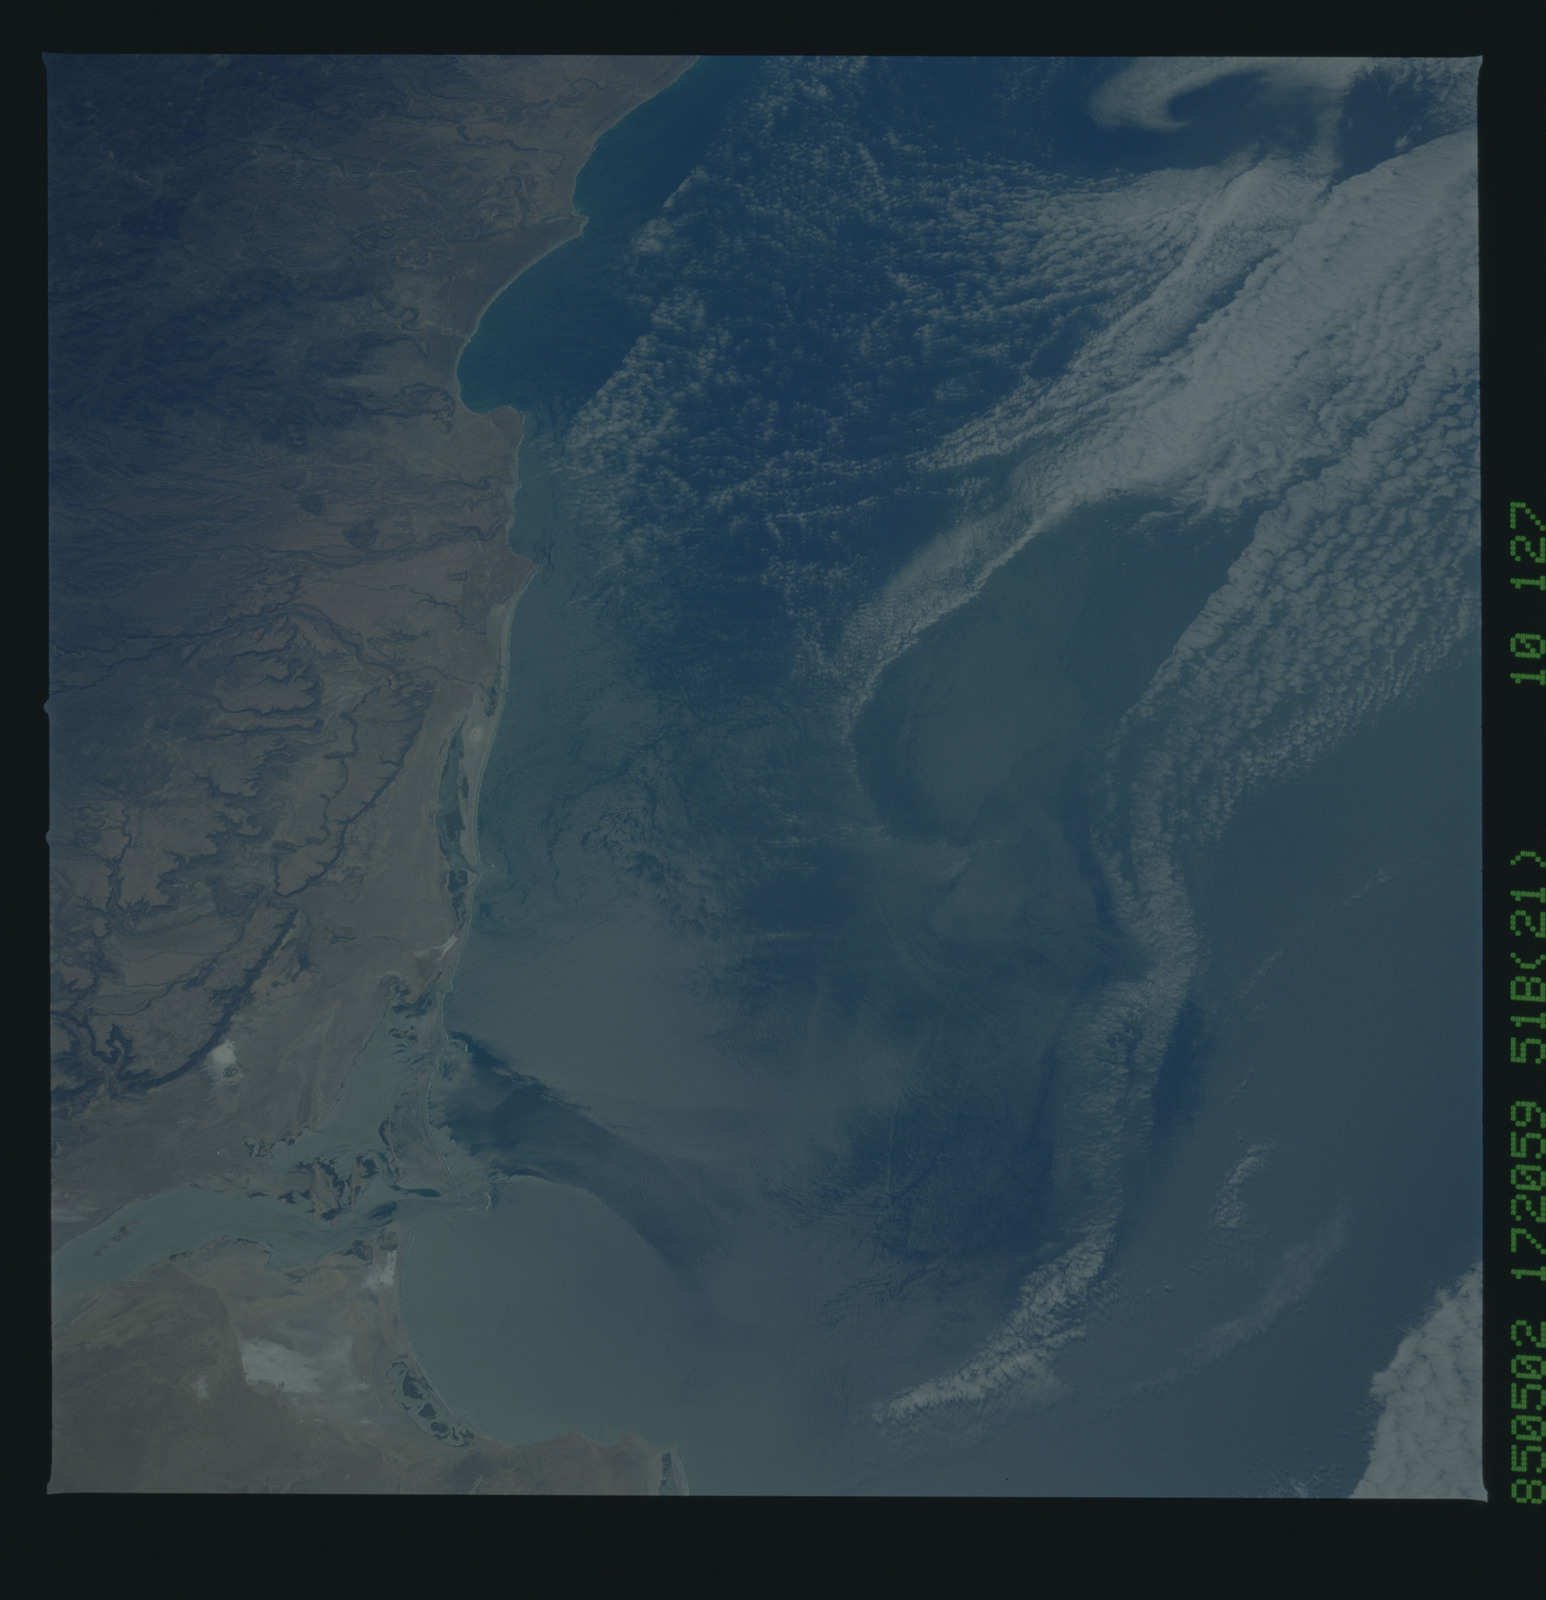 51B-52-025 - STS-51B - STS-51B earth observation